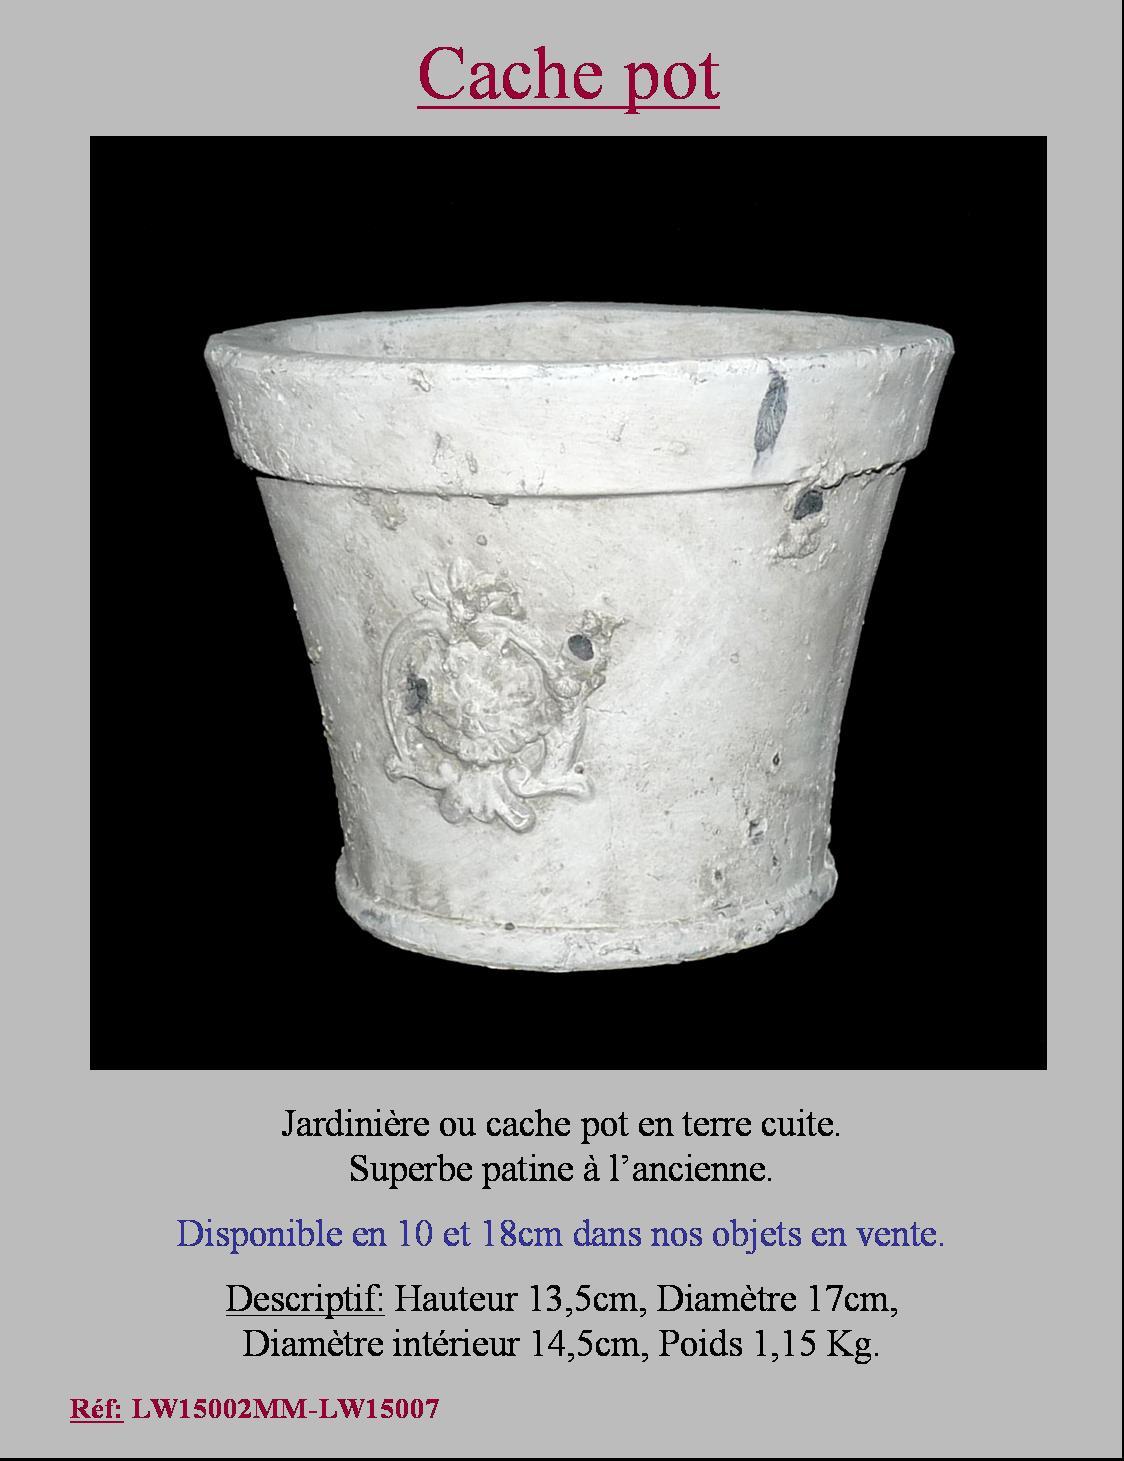 style ancien cache pot porte plante vase jardiniere en terre cuite 13 50x17cm ebay. Black Bedroom Furniture Sets. Home Design Ideas